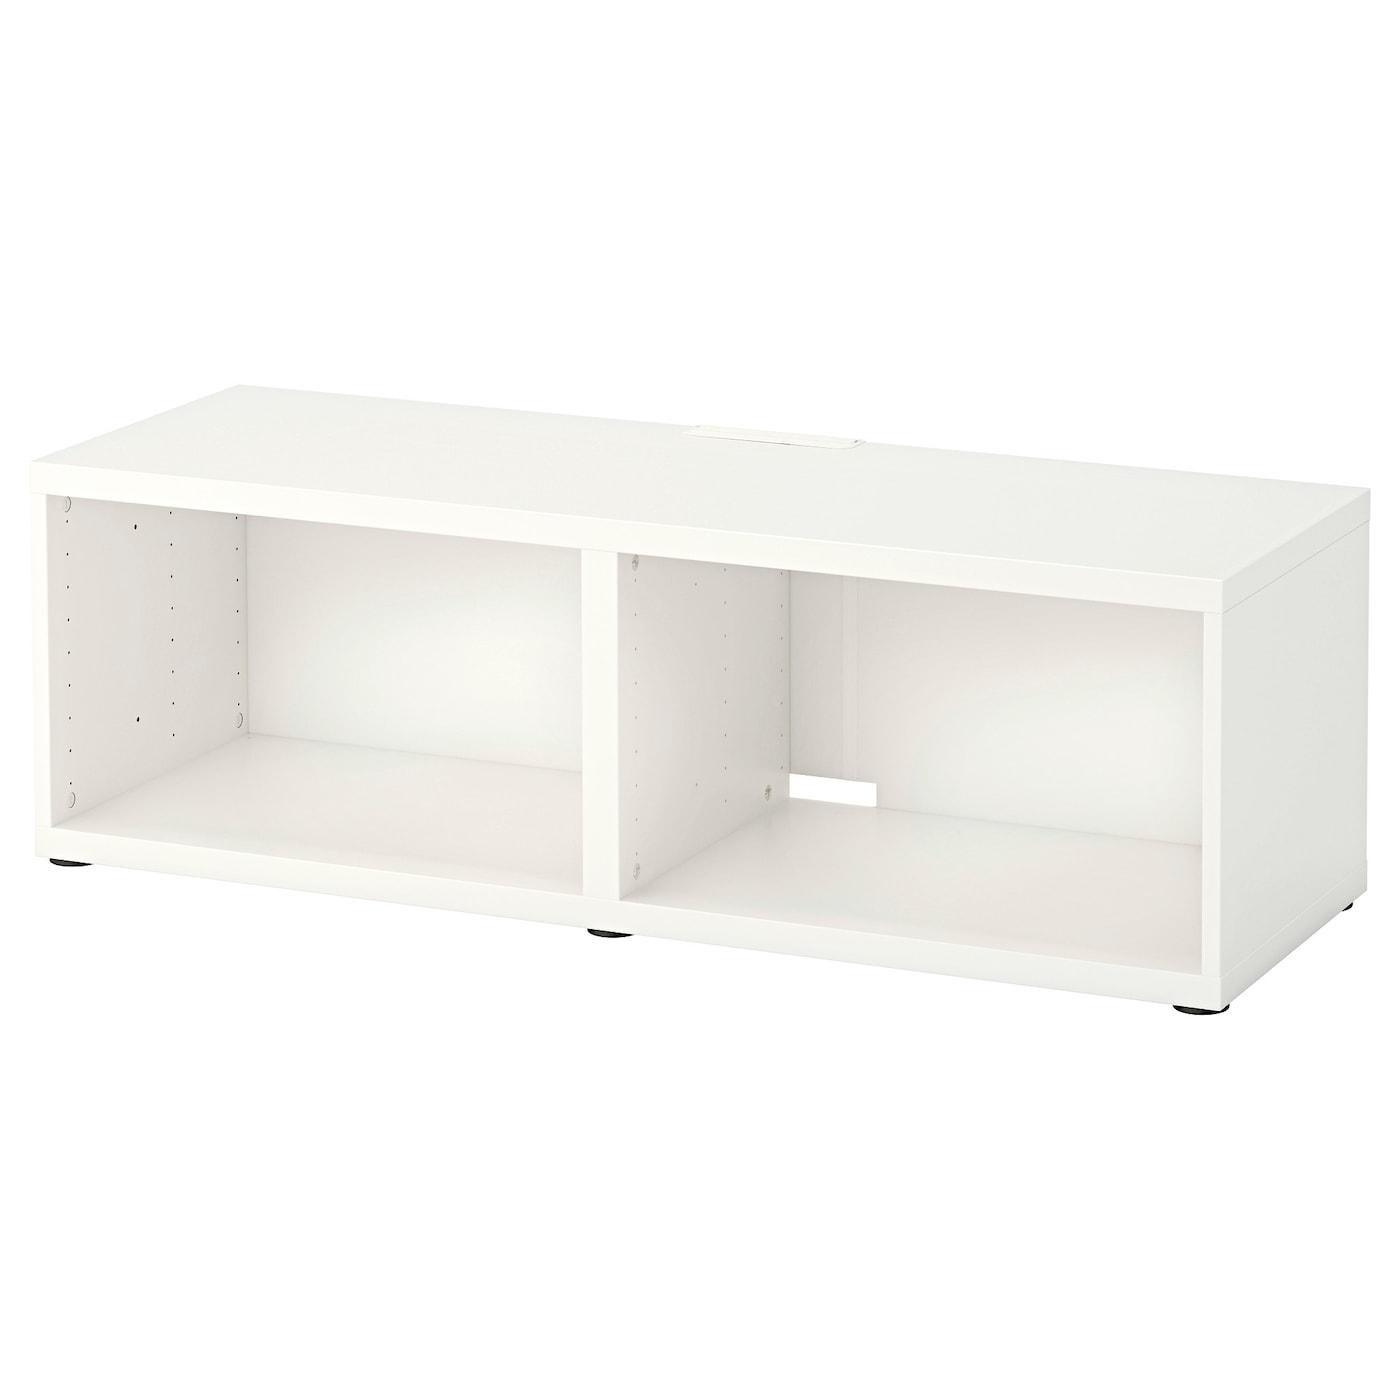 "Meuble Ikea Besta Blanc bestÅ meuble télé - blanc 47 1/4x15 3/4x15 "" (120x40x38 cm)"